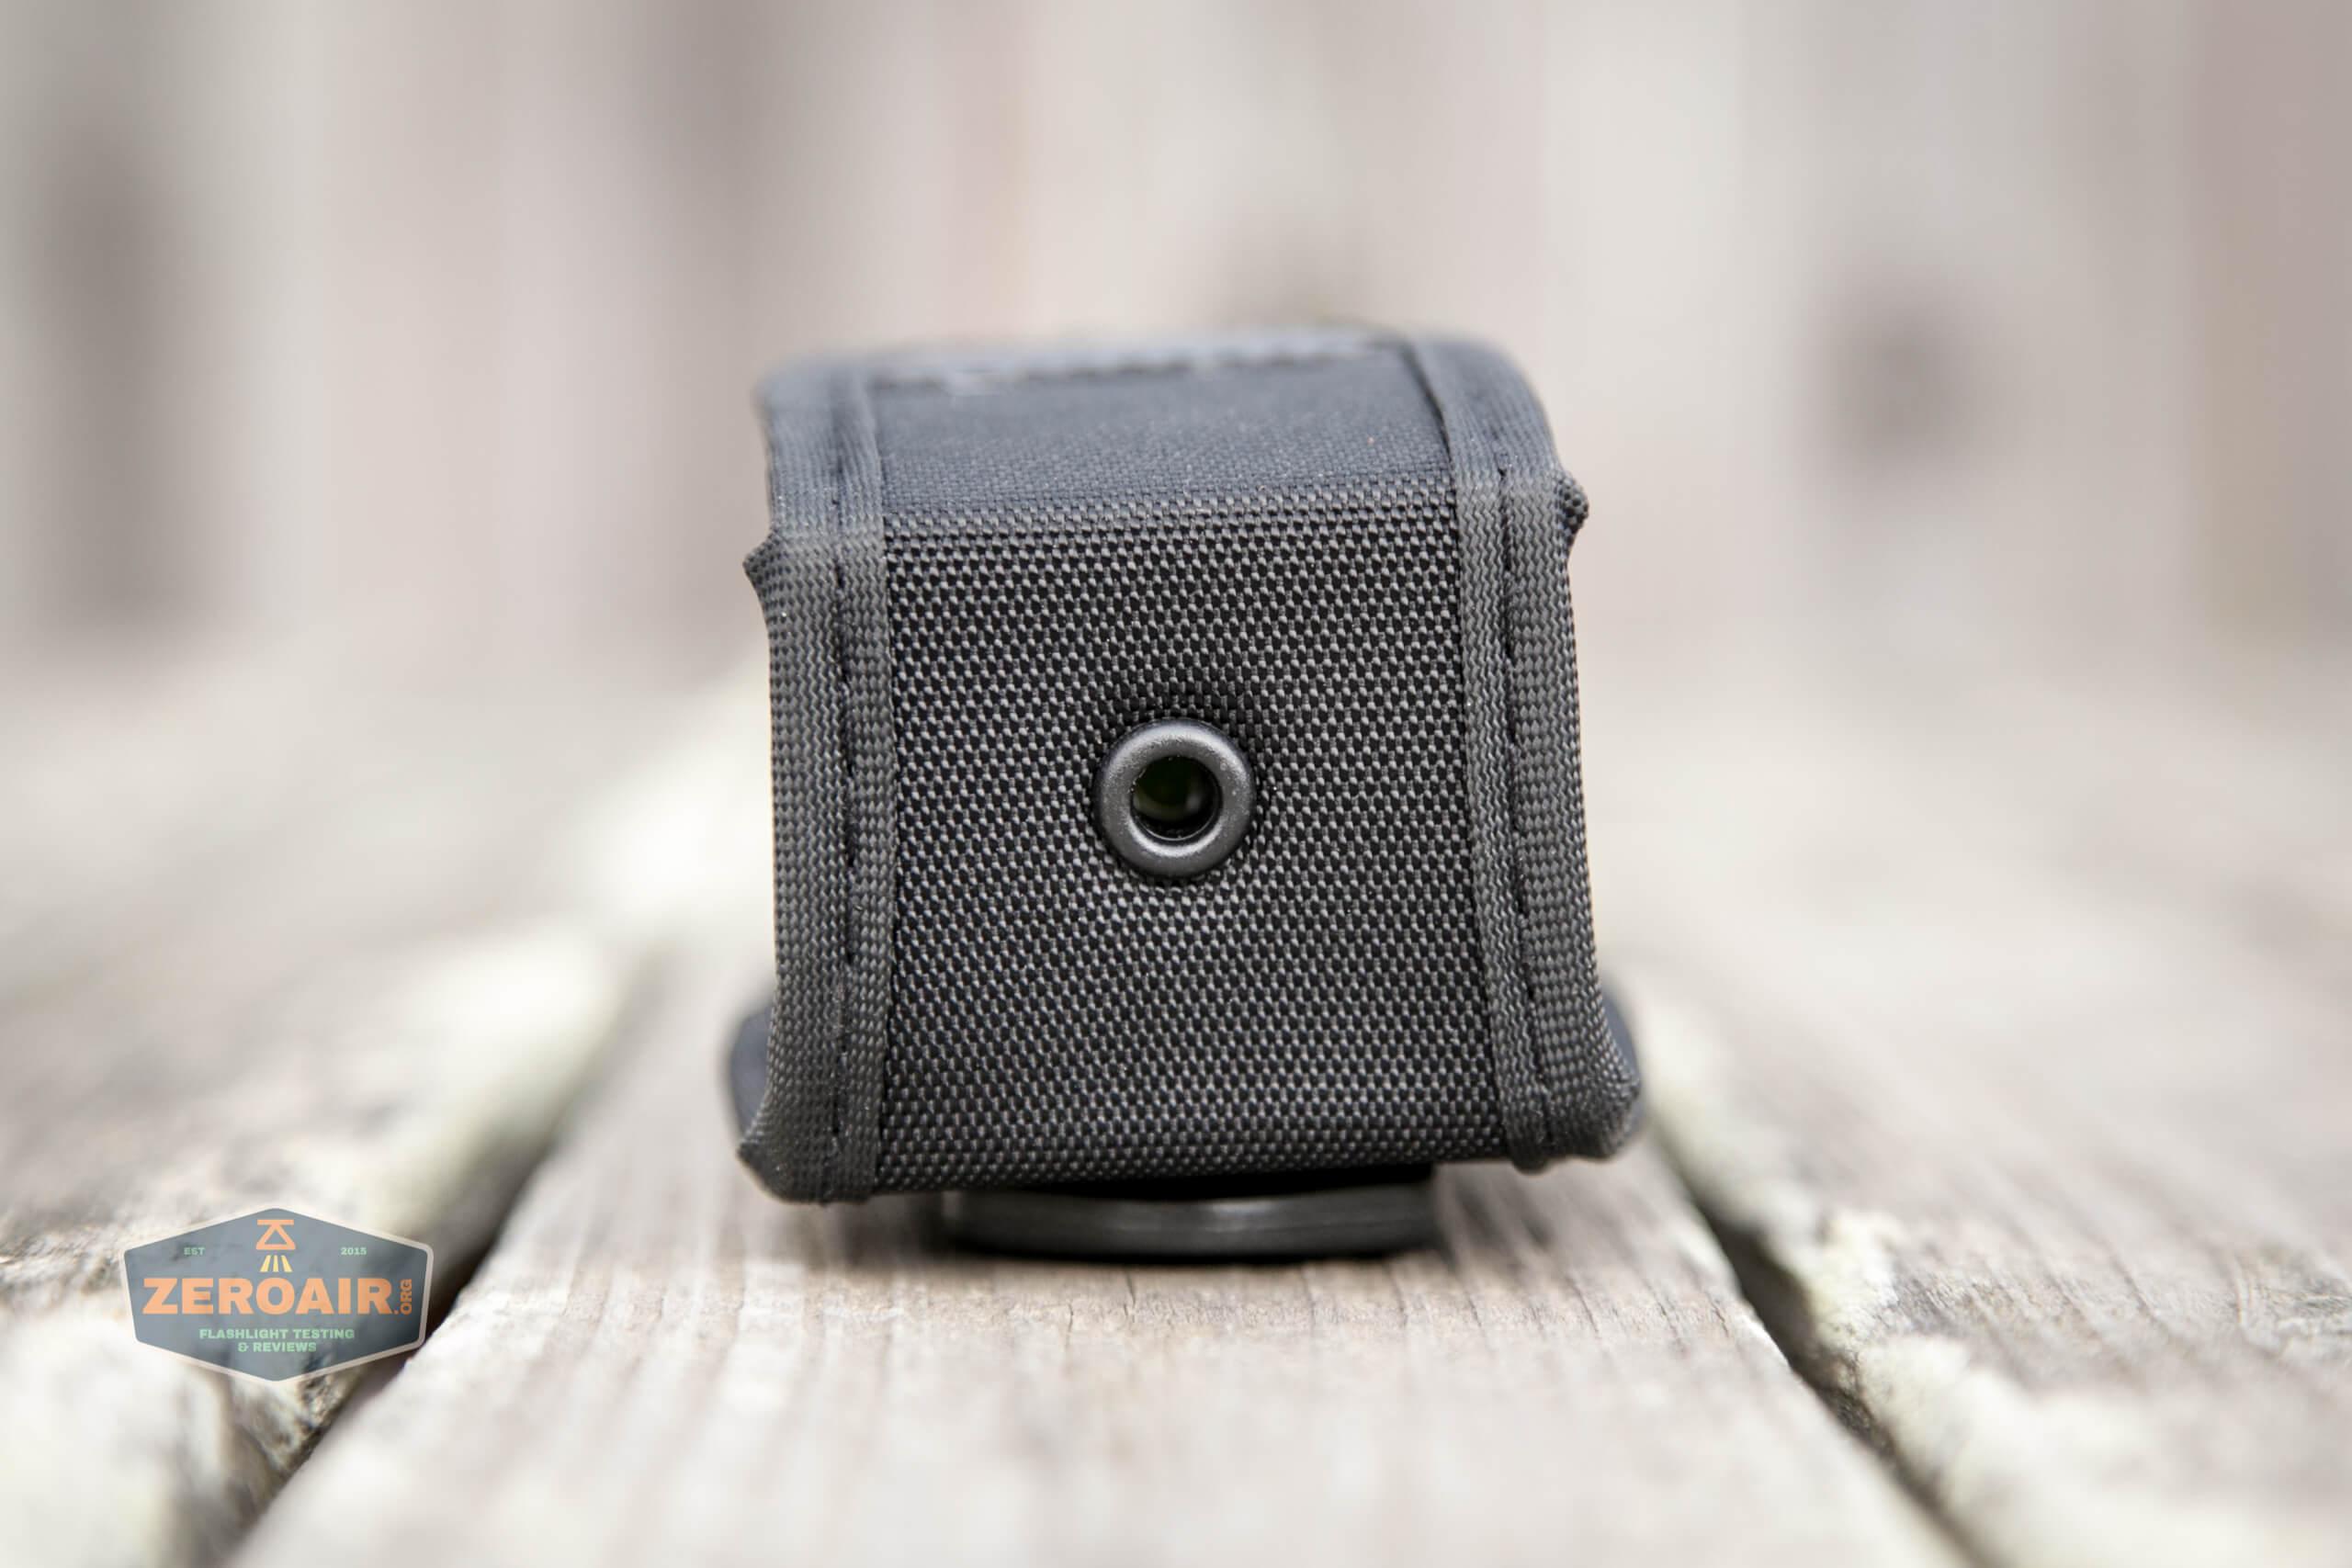 olight freyr rgb flashlight in nylon pouch